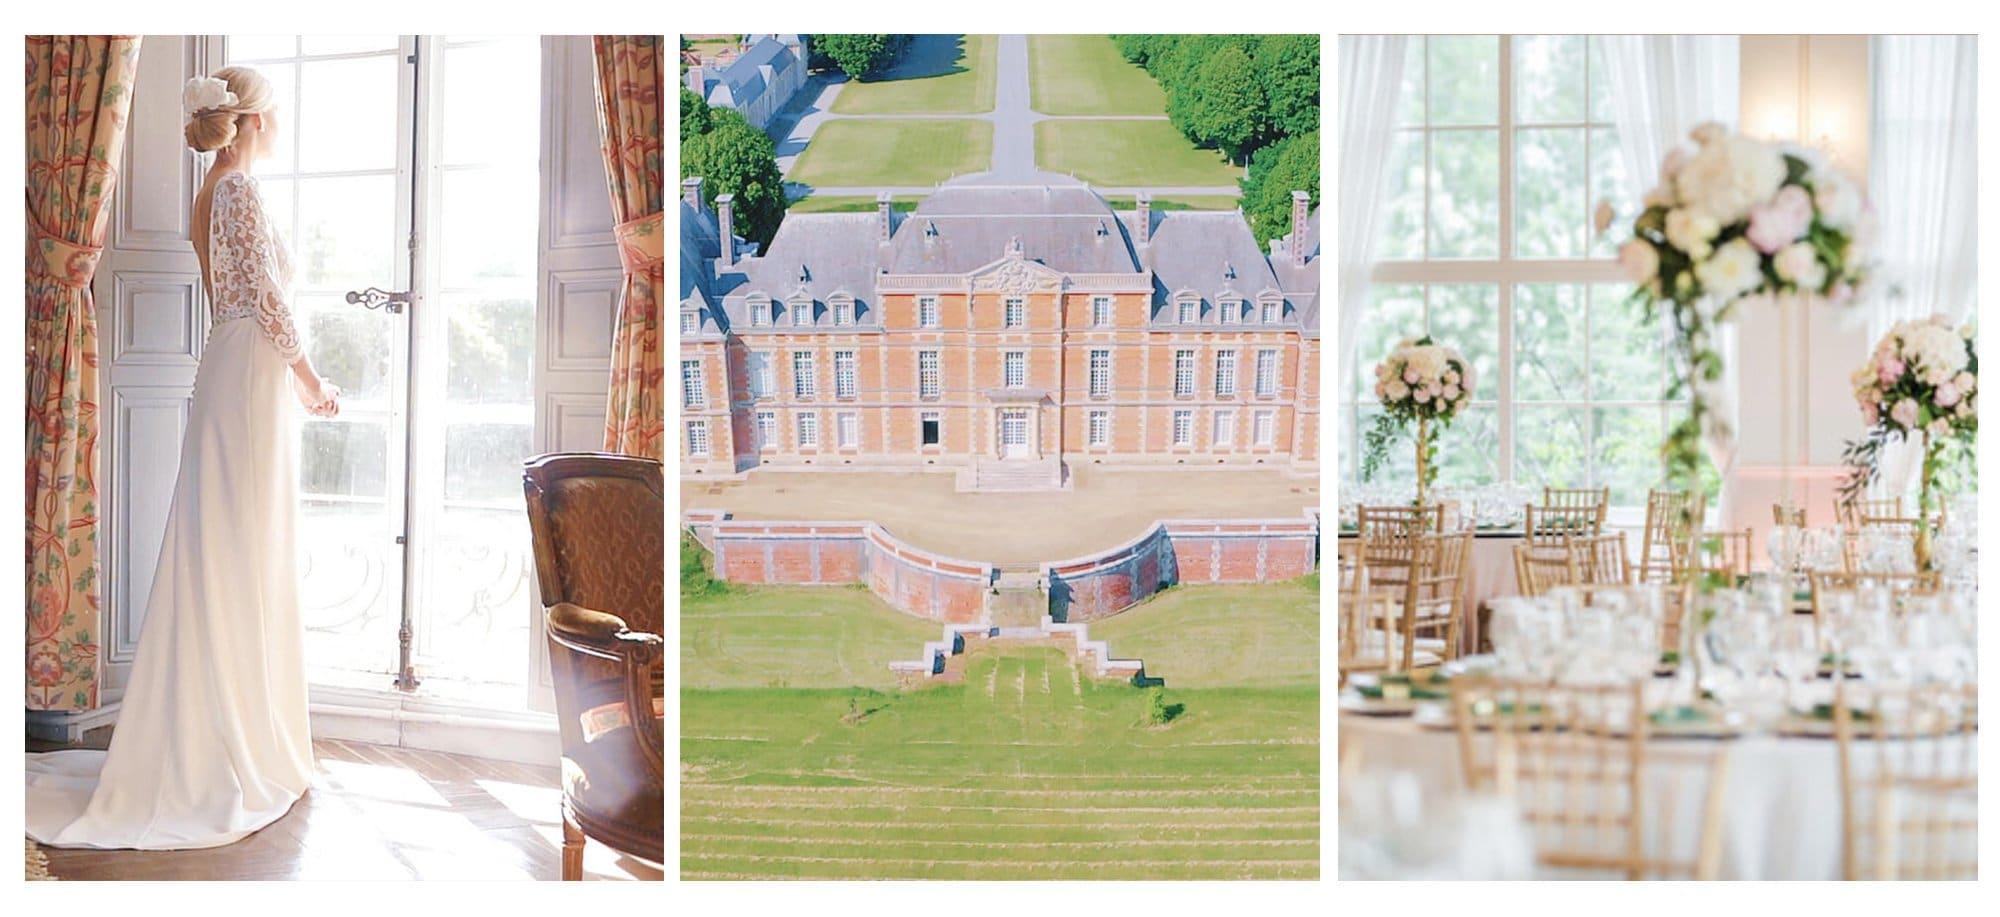 Château de Tilloloy - Vidéaste mariage France - Wedding videographer French